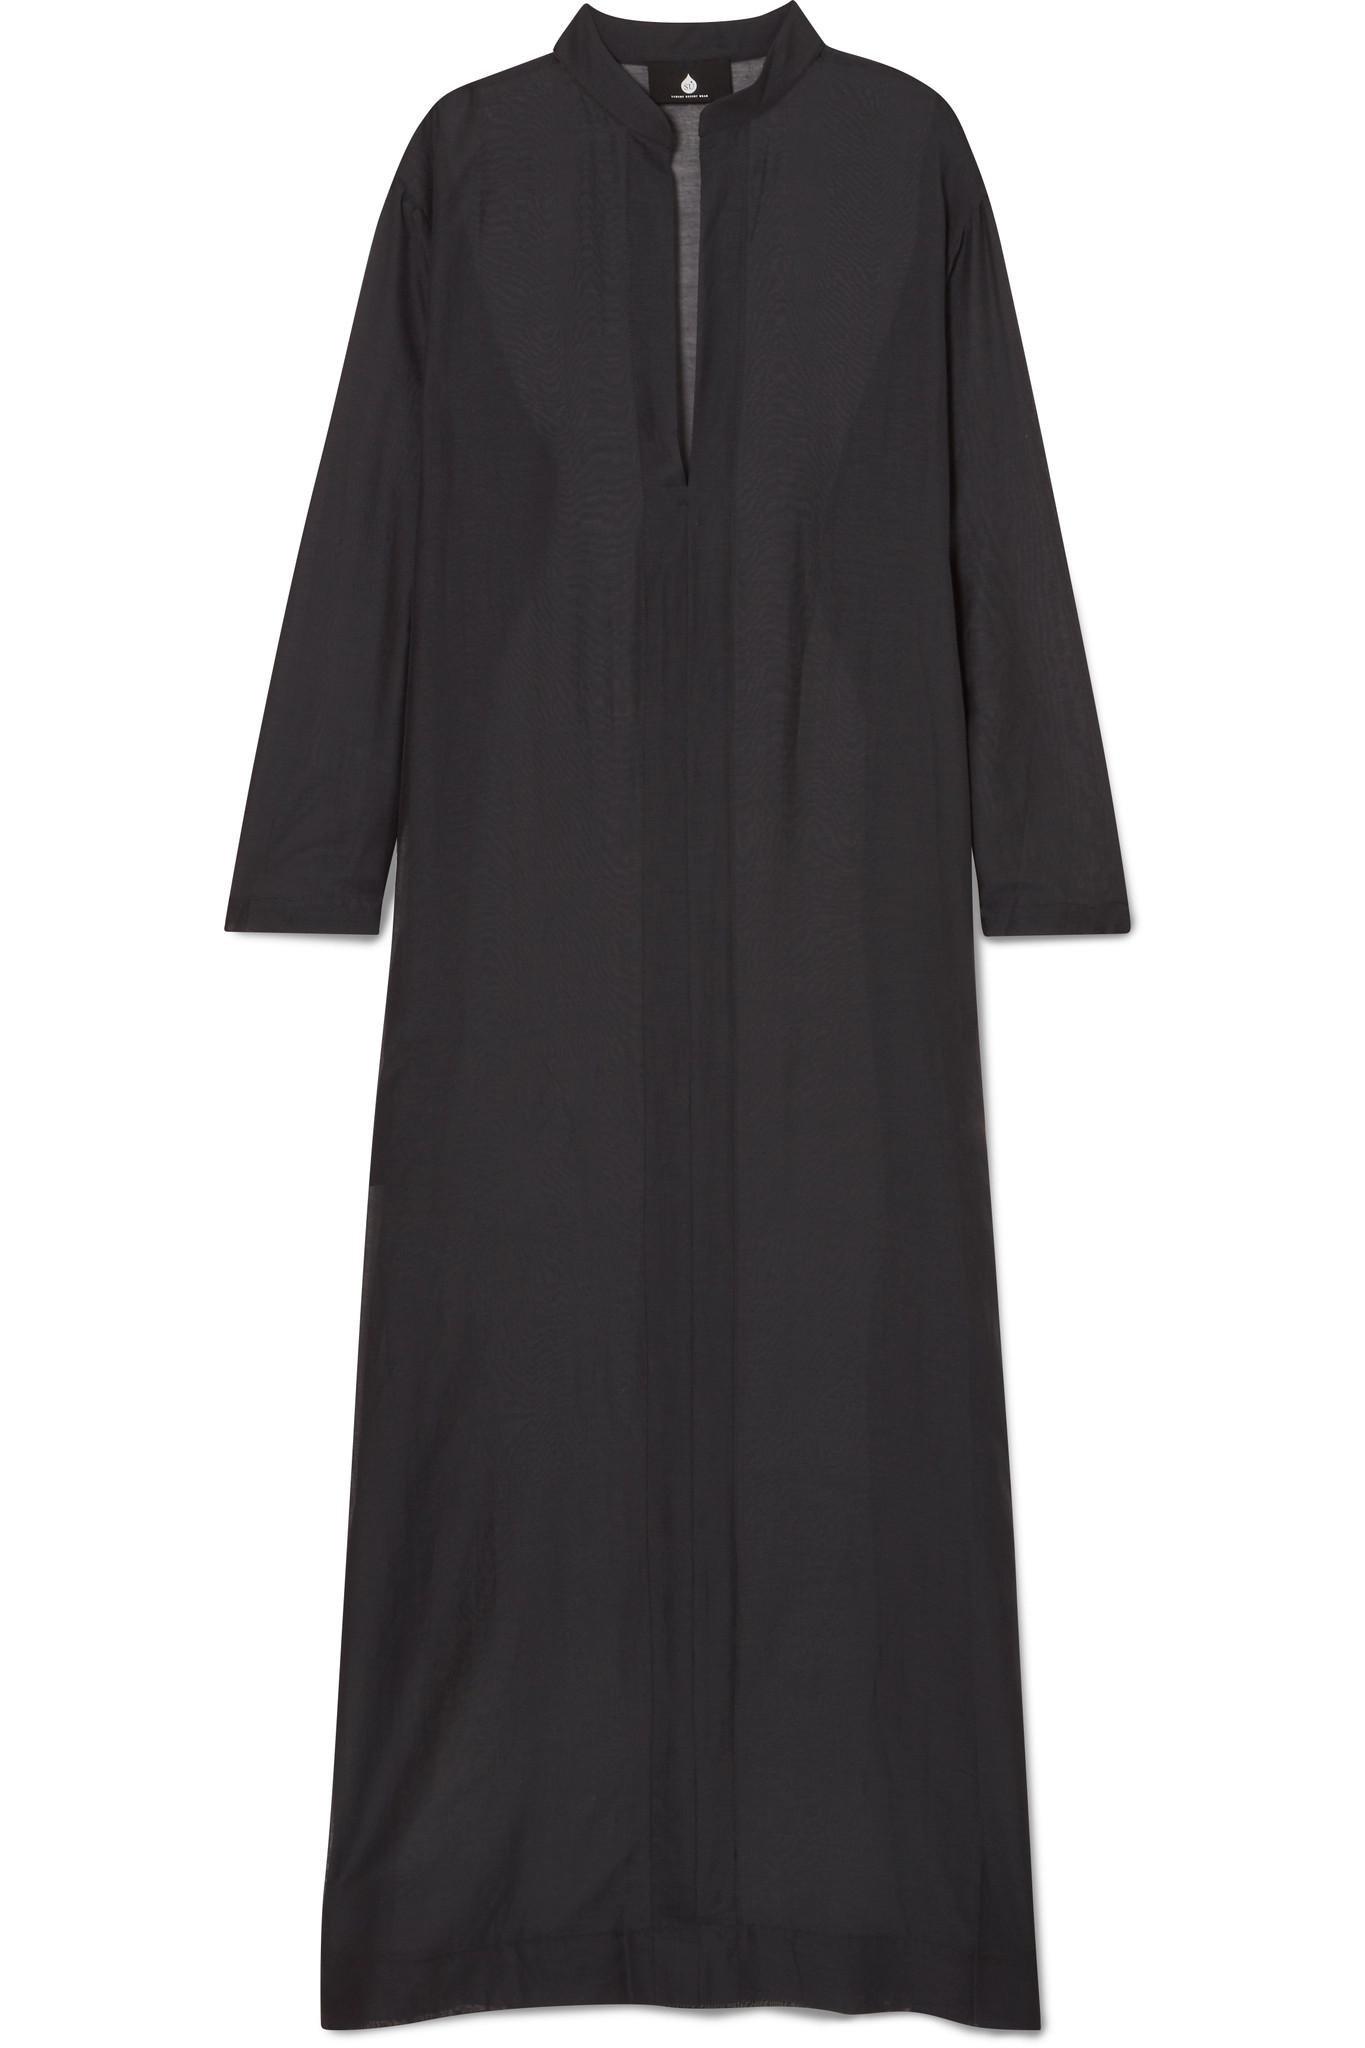 Gandu Cotton And Silk-blend Voile Kaftan - Black SU PARIS NHN8aLB4C9